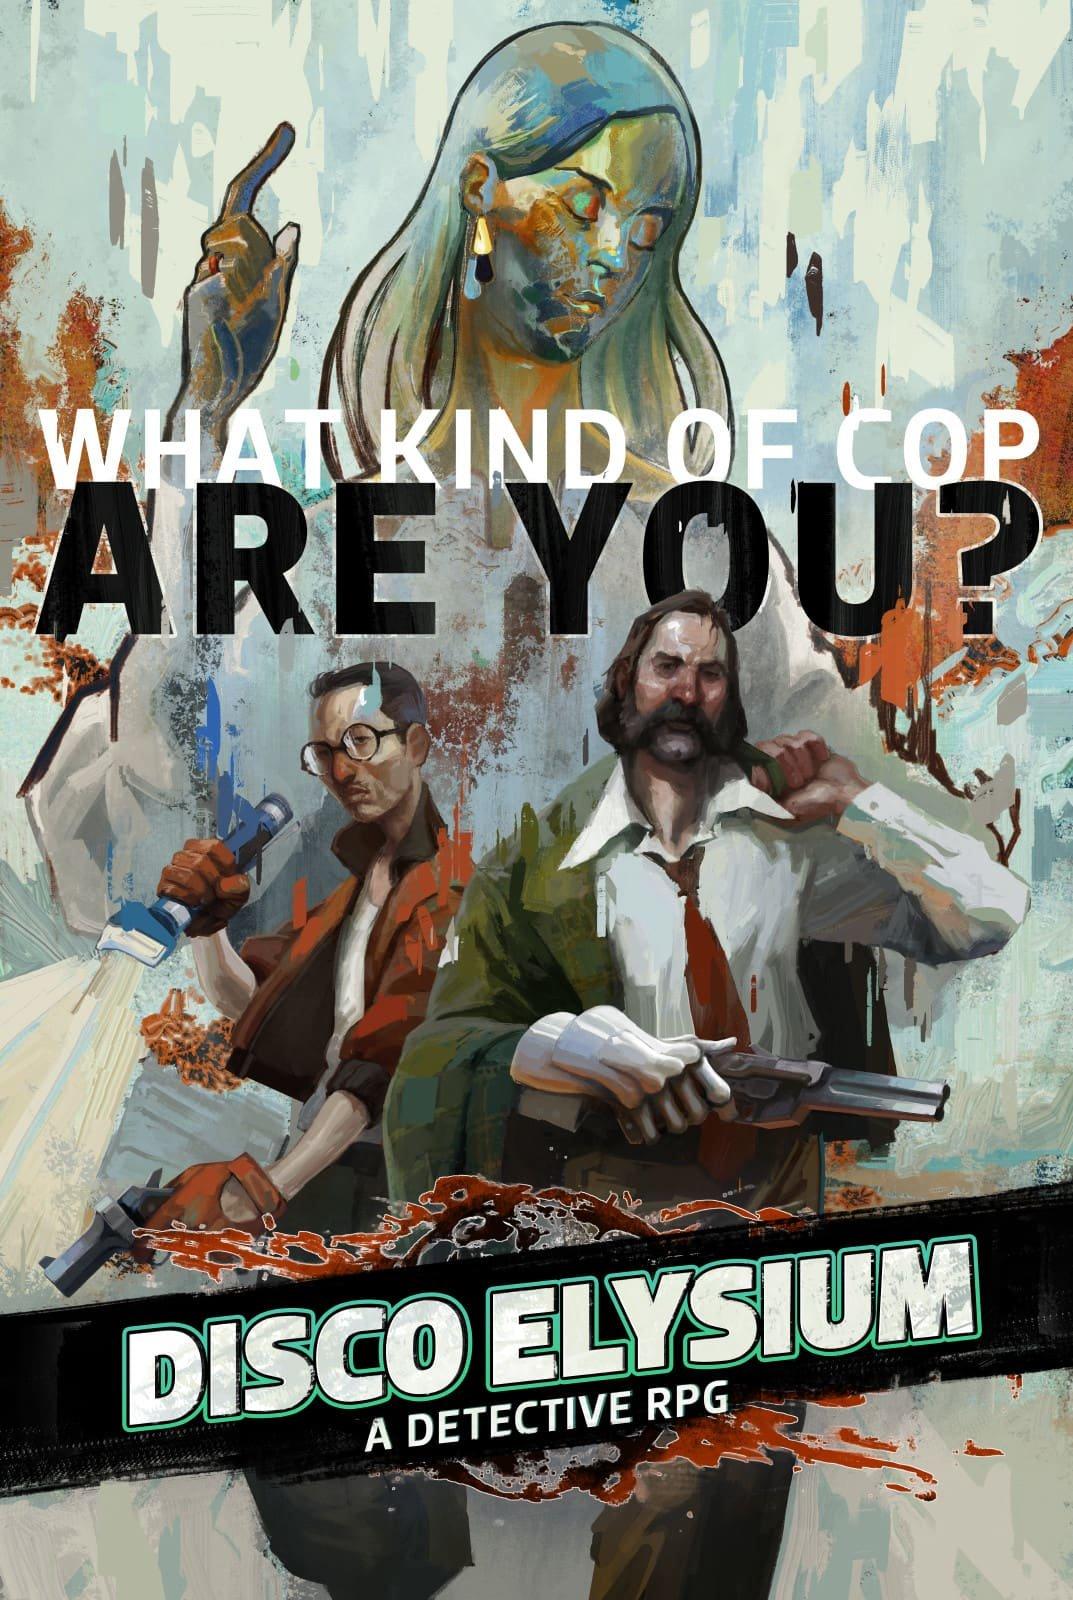 Disco Elysium Review 2